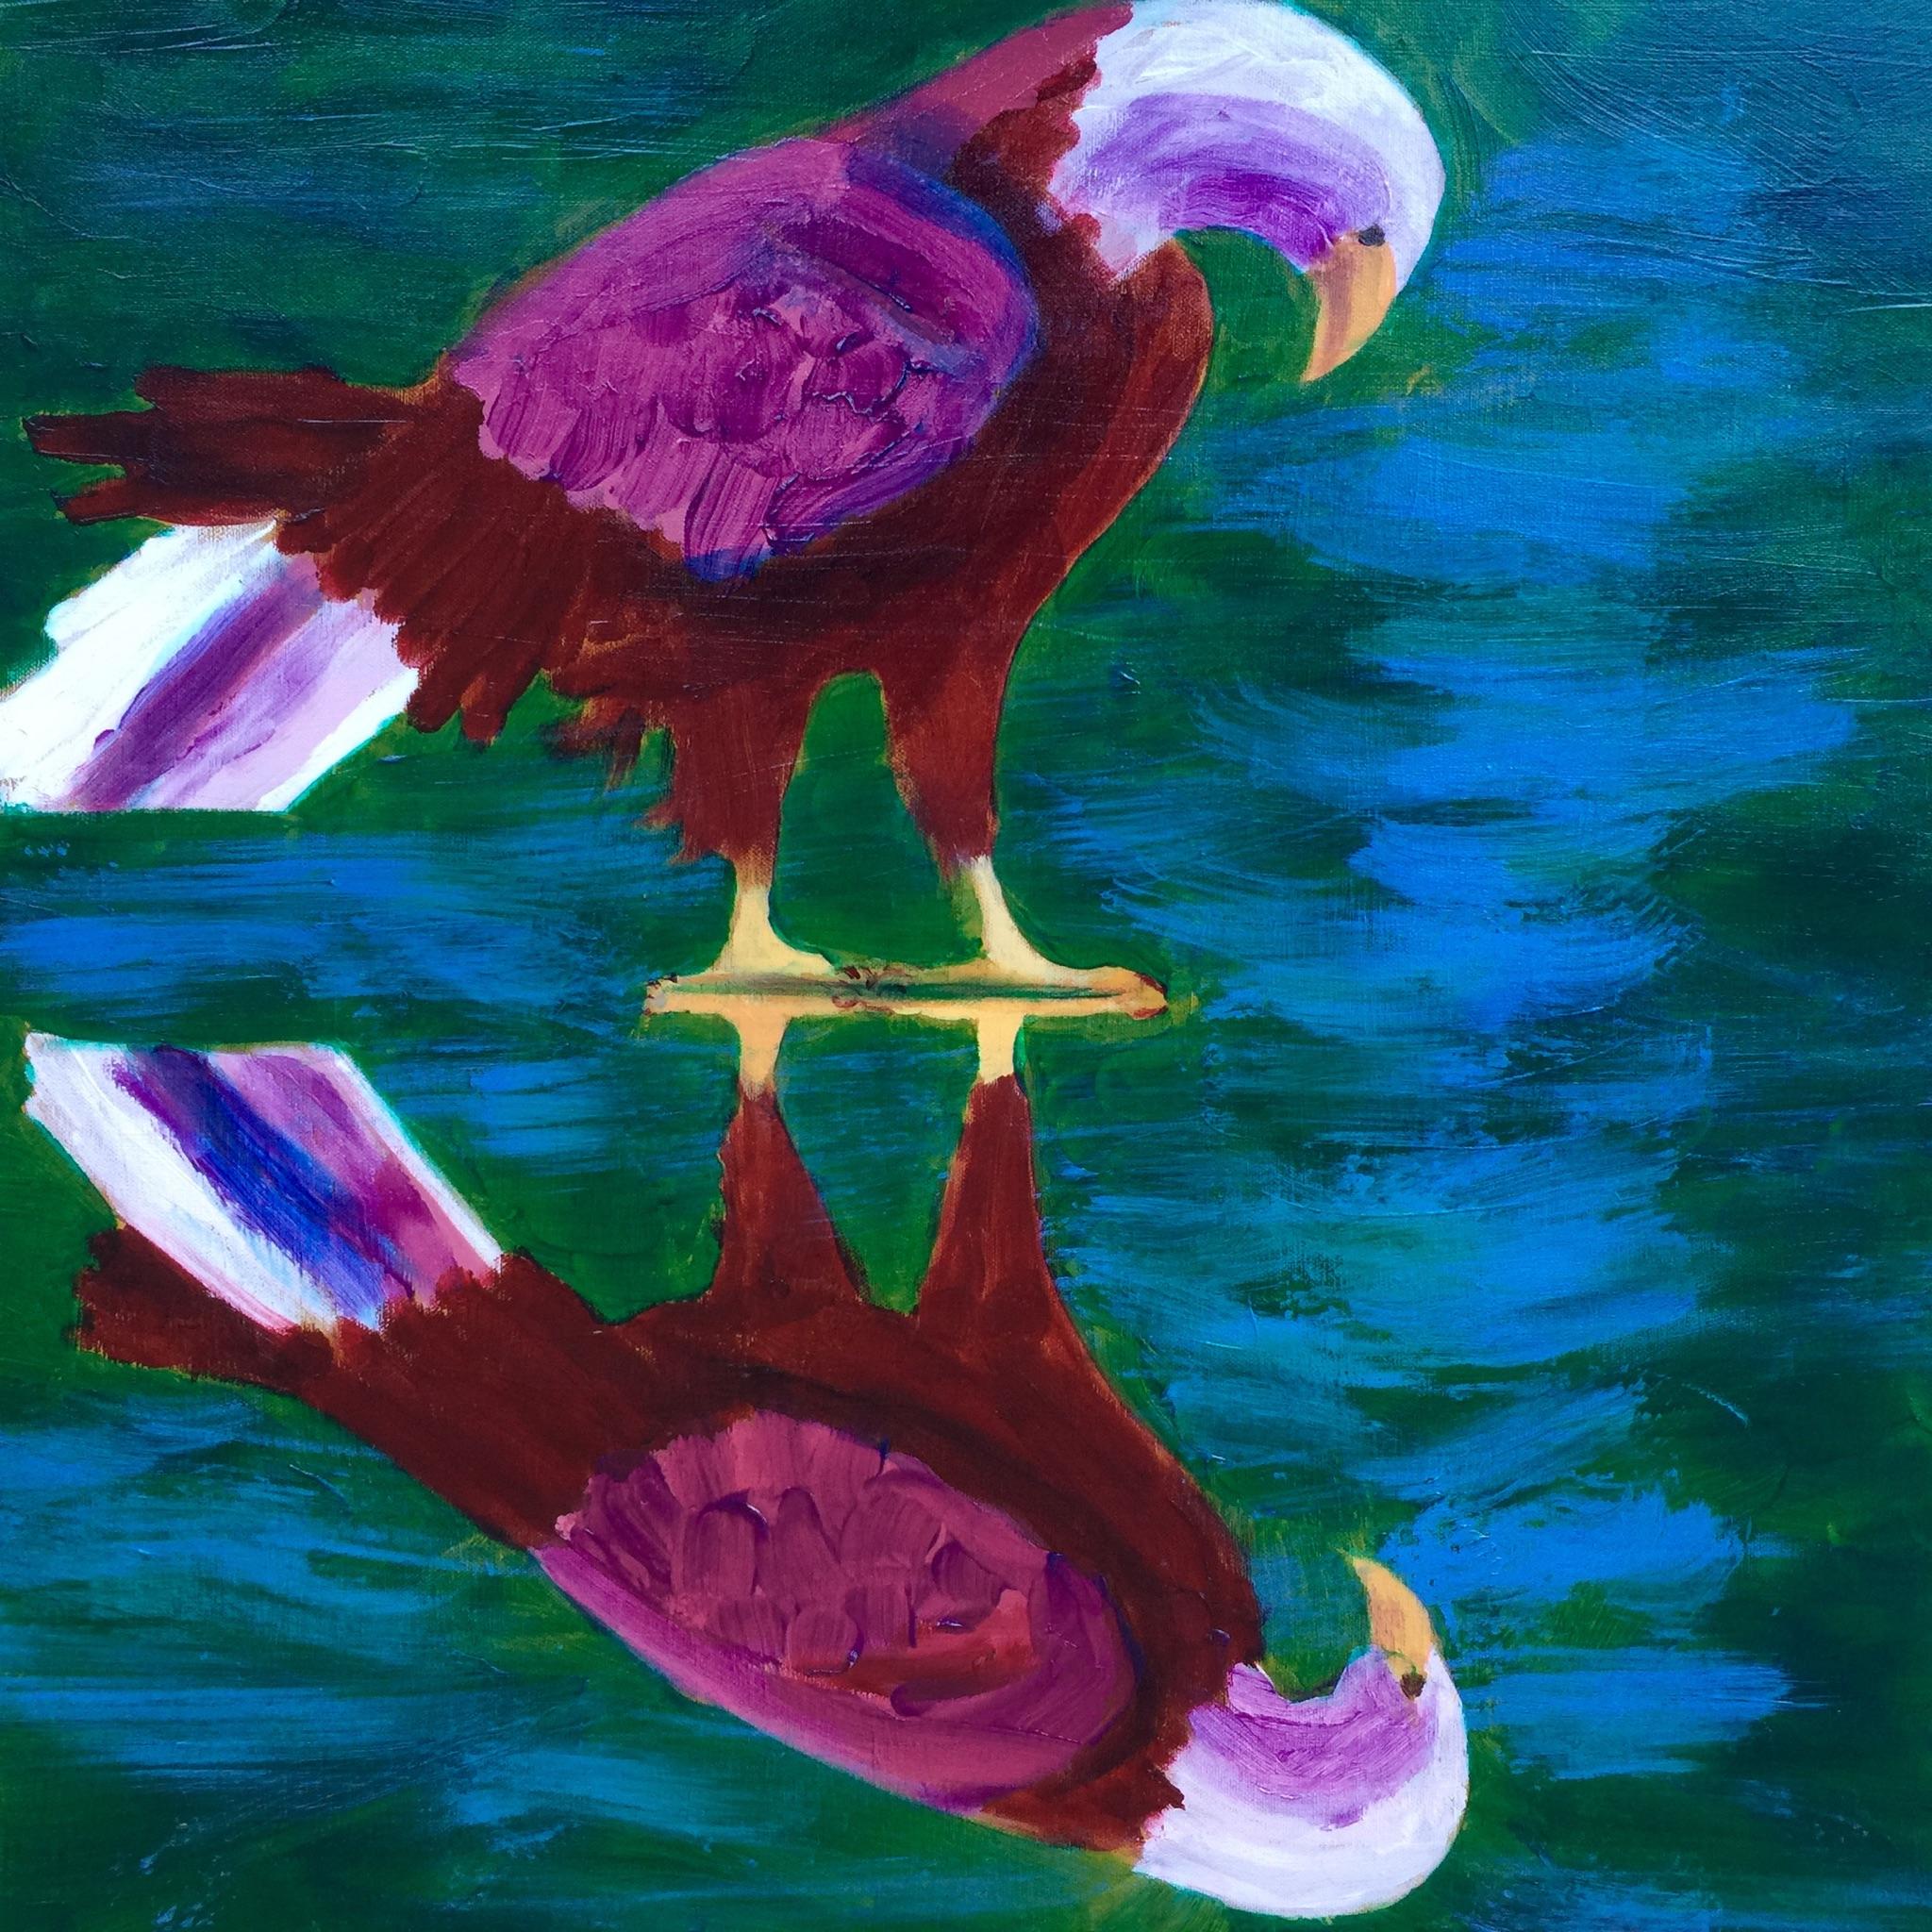 Eagle - - Original for Sale - Prints Available